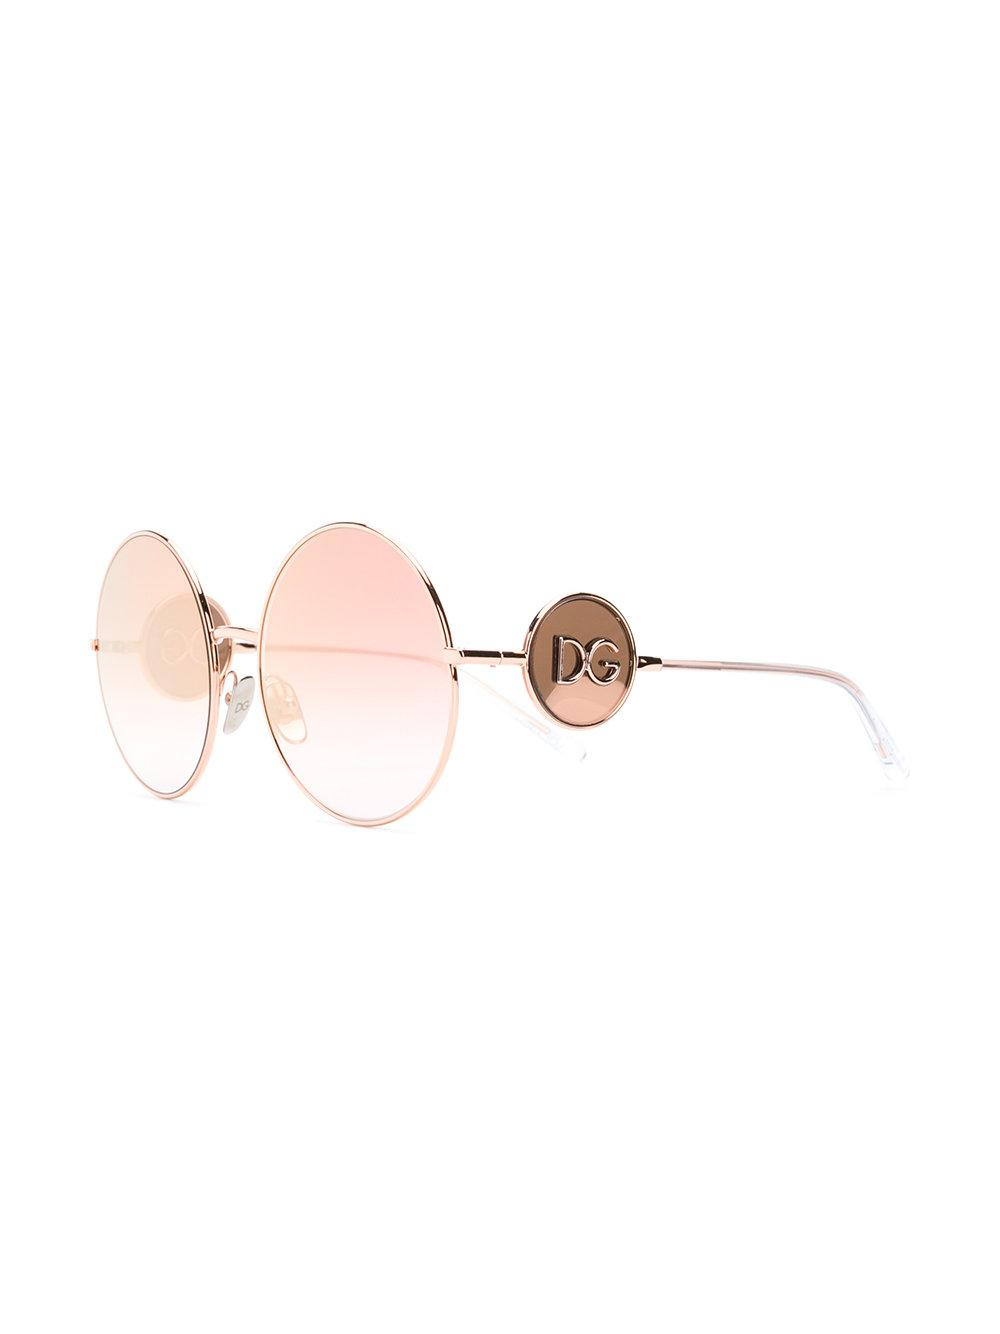 b818c26f0cc Dolce   Gabbana Round Shaped Sunglasses in Metallic - Lyst